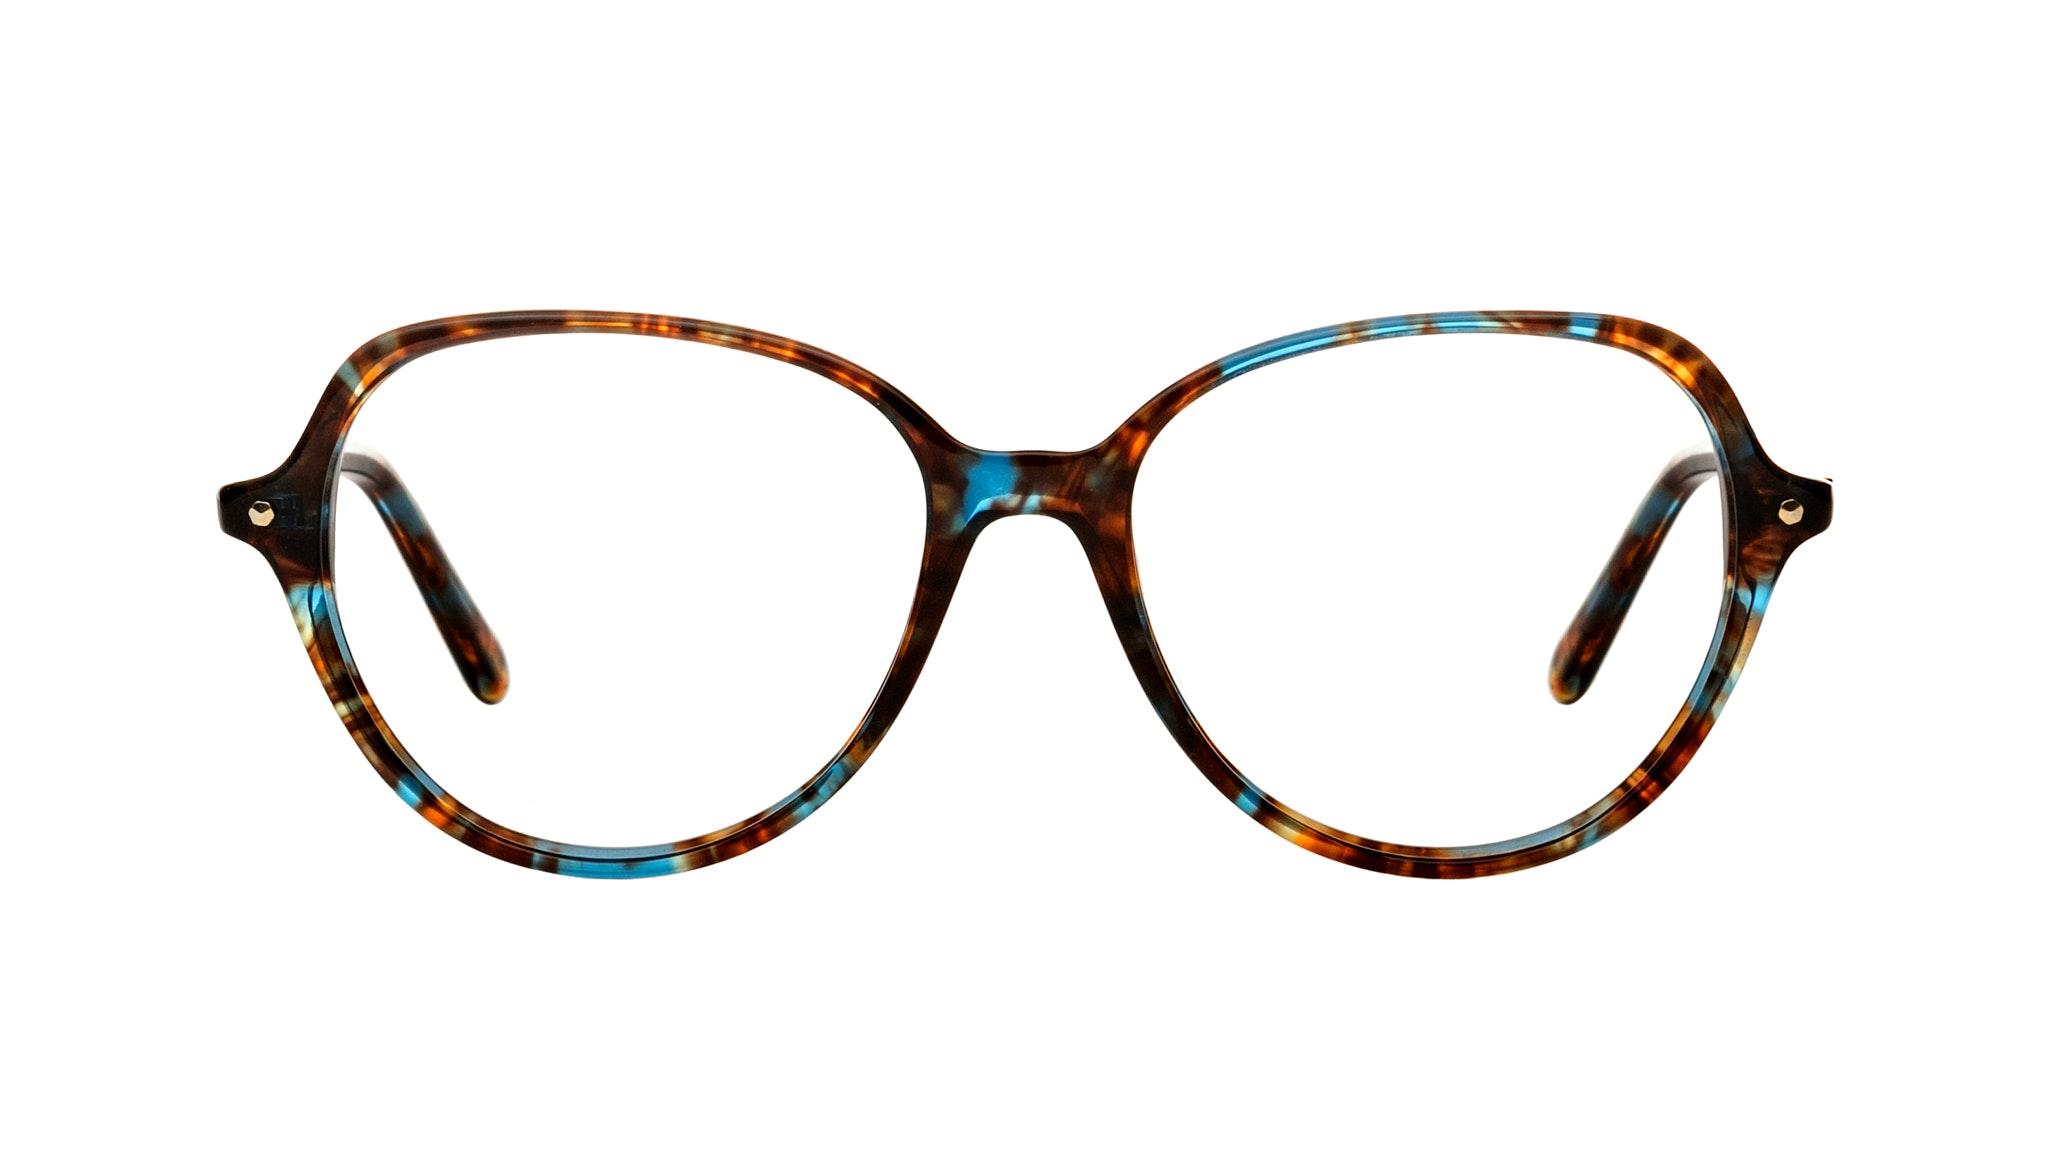 Affordable Fashion Glasses Round Eyeglasses Women Dazzle Blue Storm Front